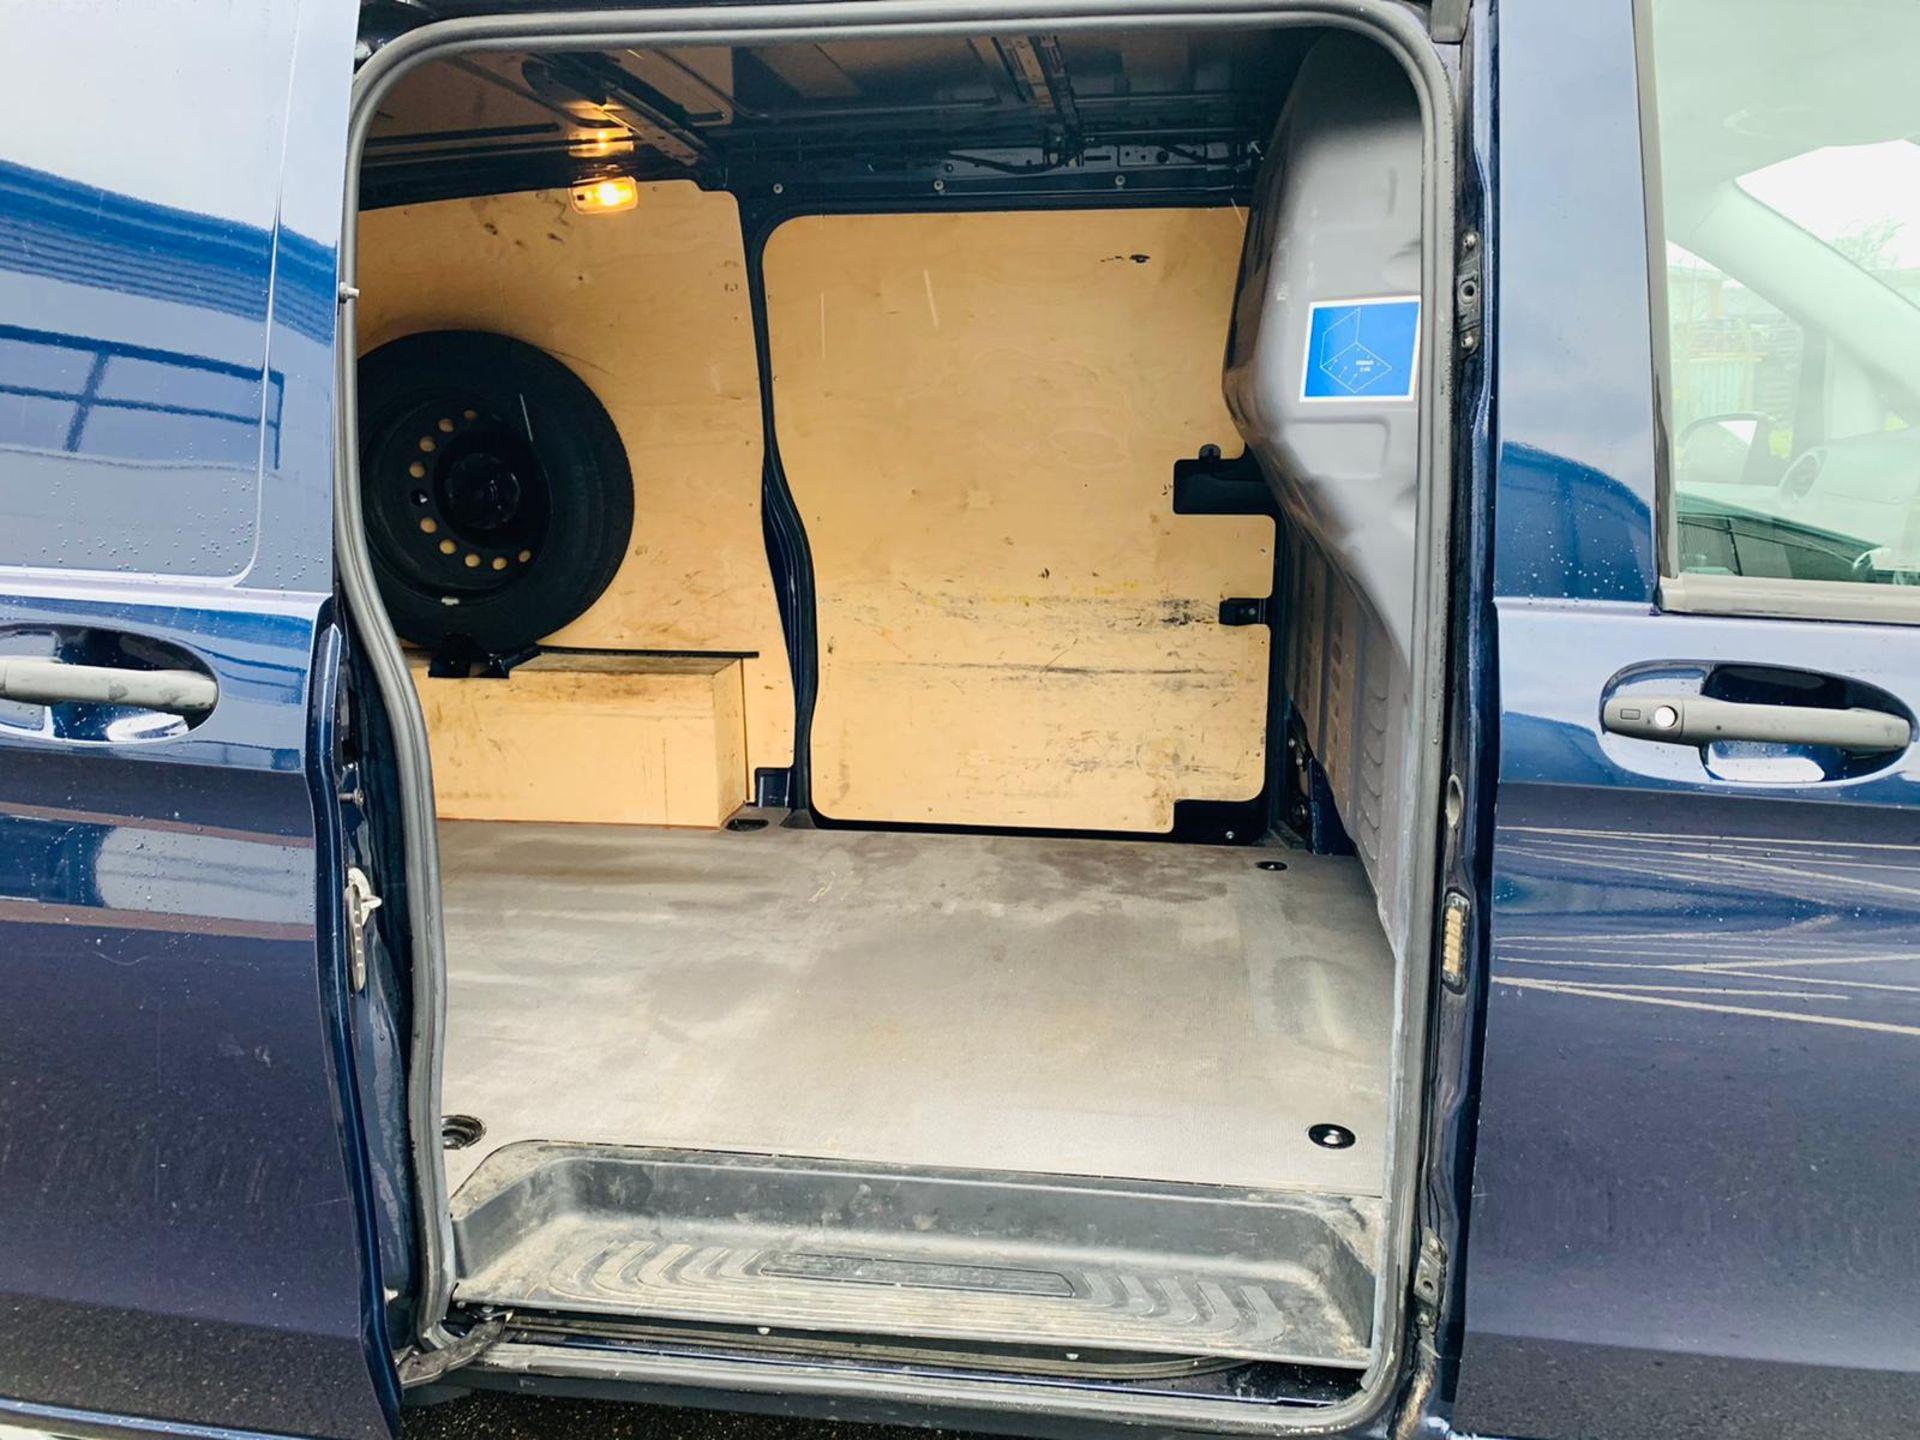 (RESERVE MET) Mercedes Vito 116Cdi Sporty Spec (161 BHP) Bluetech 6 Speed Van - 2016 Model - AC - Image 11 of 28